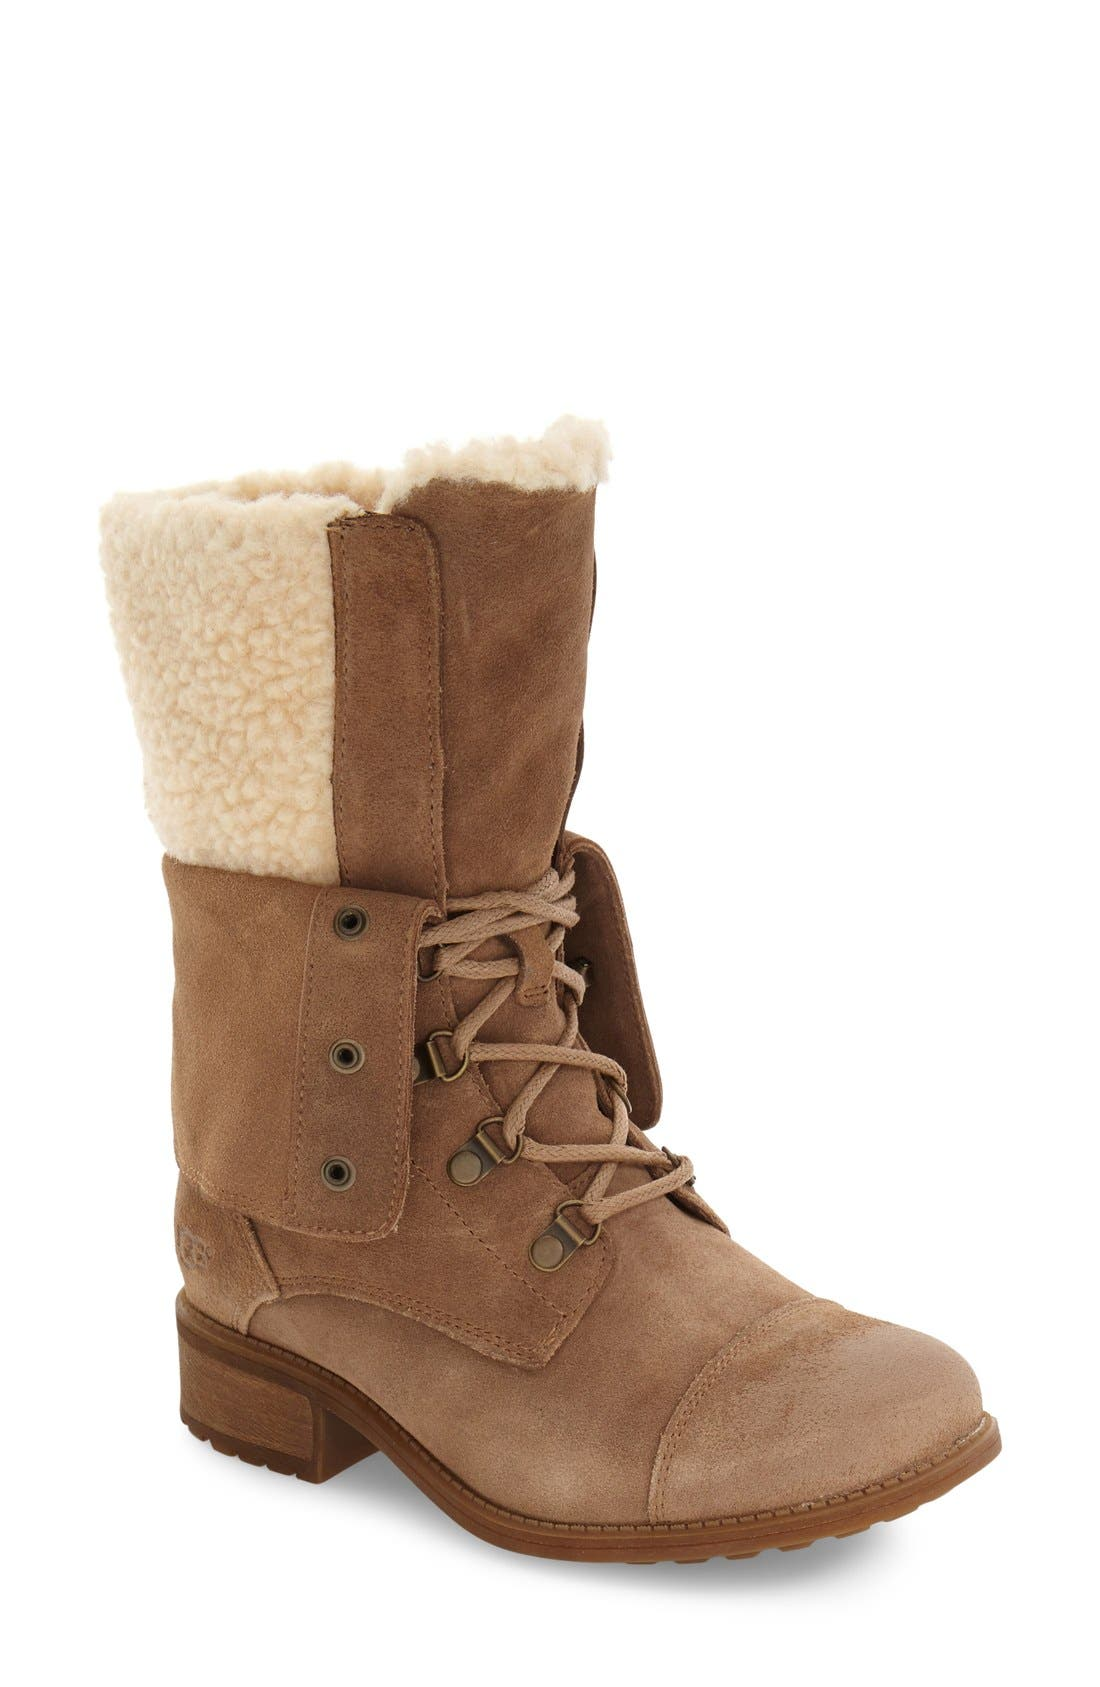 Main Image - UGG® Gradin Water Resistant Boot (Women)